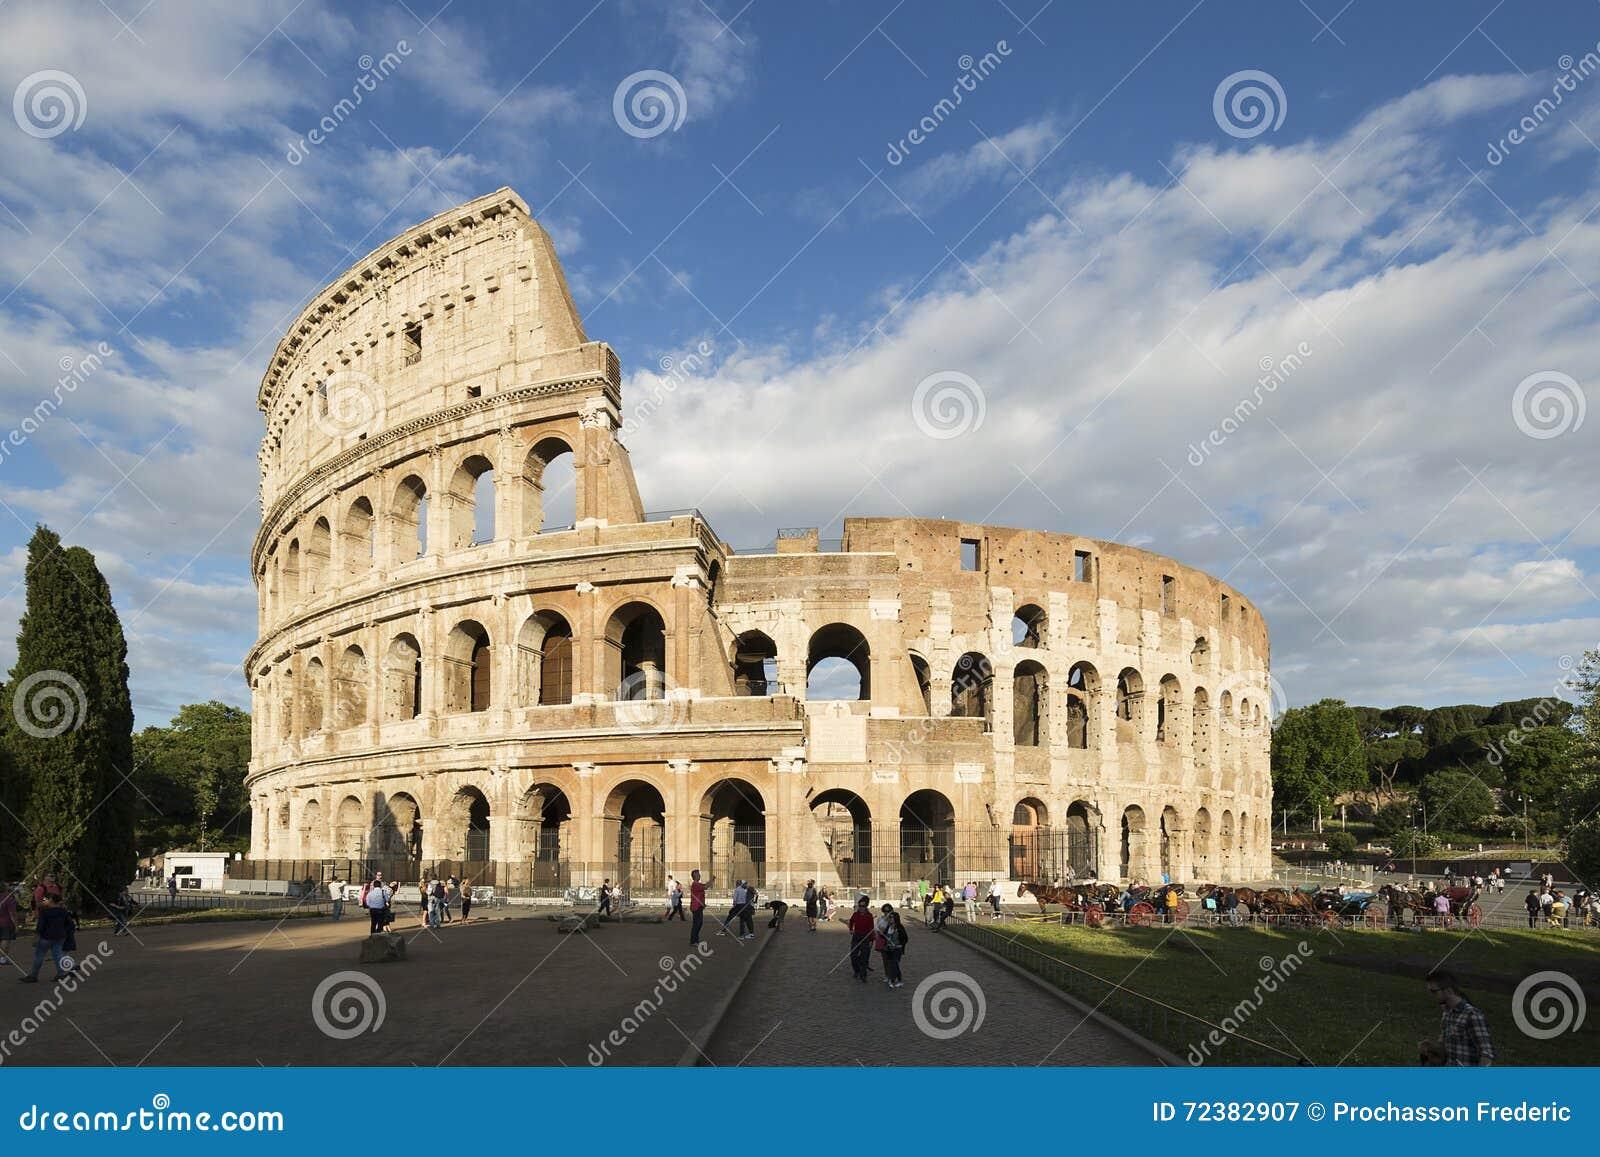 Roma Colosseum